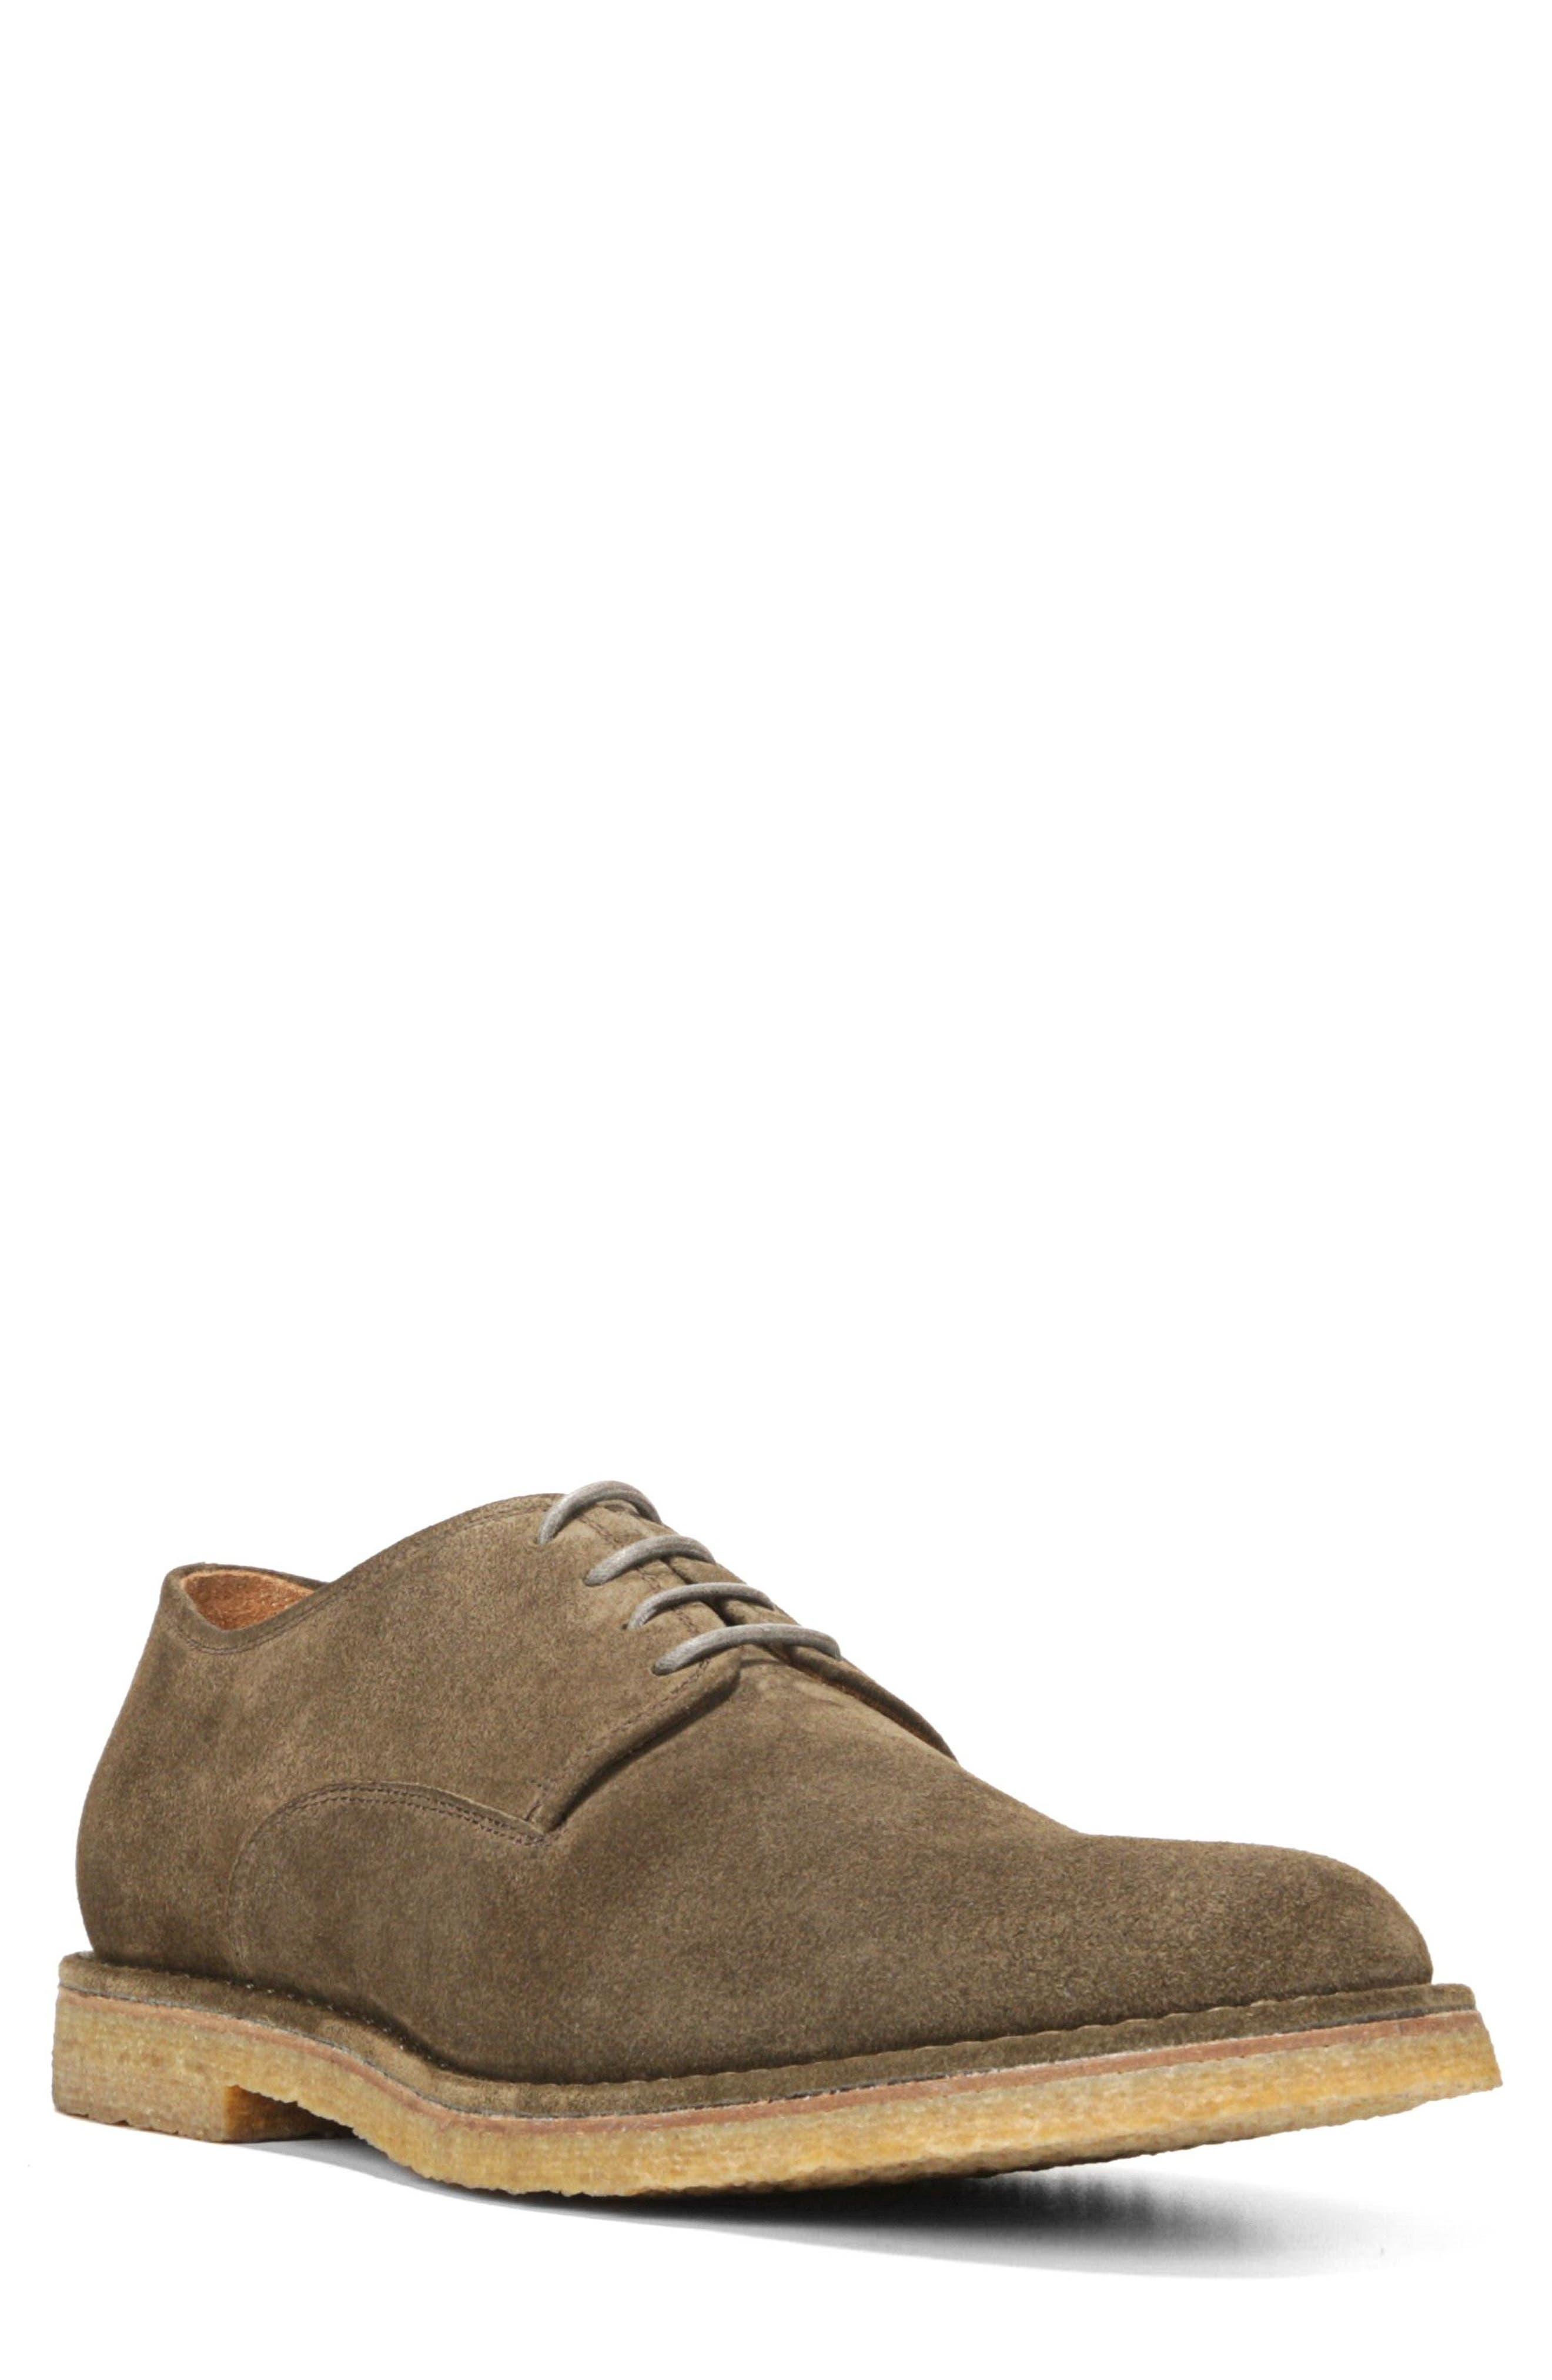 Alternate Image 1 Selected - Vince Stetson Buck Shoe (Men)